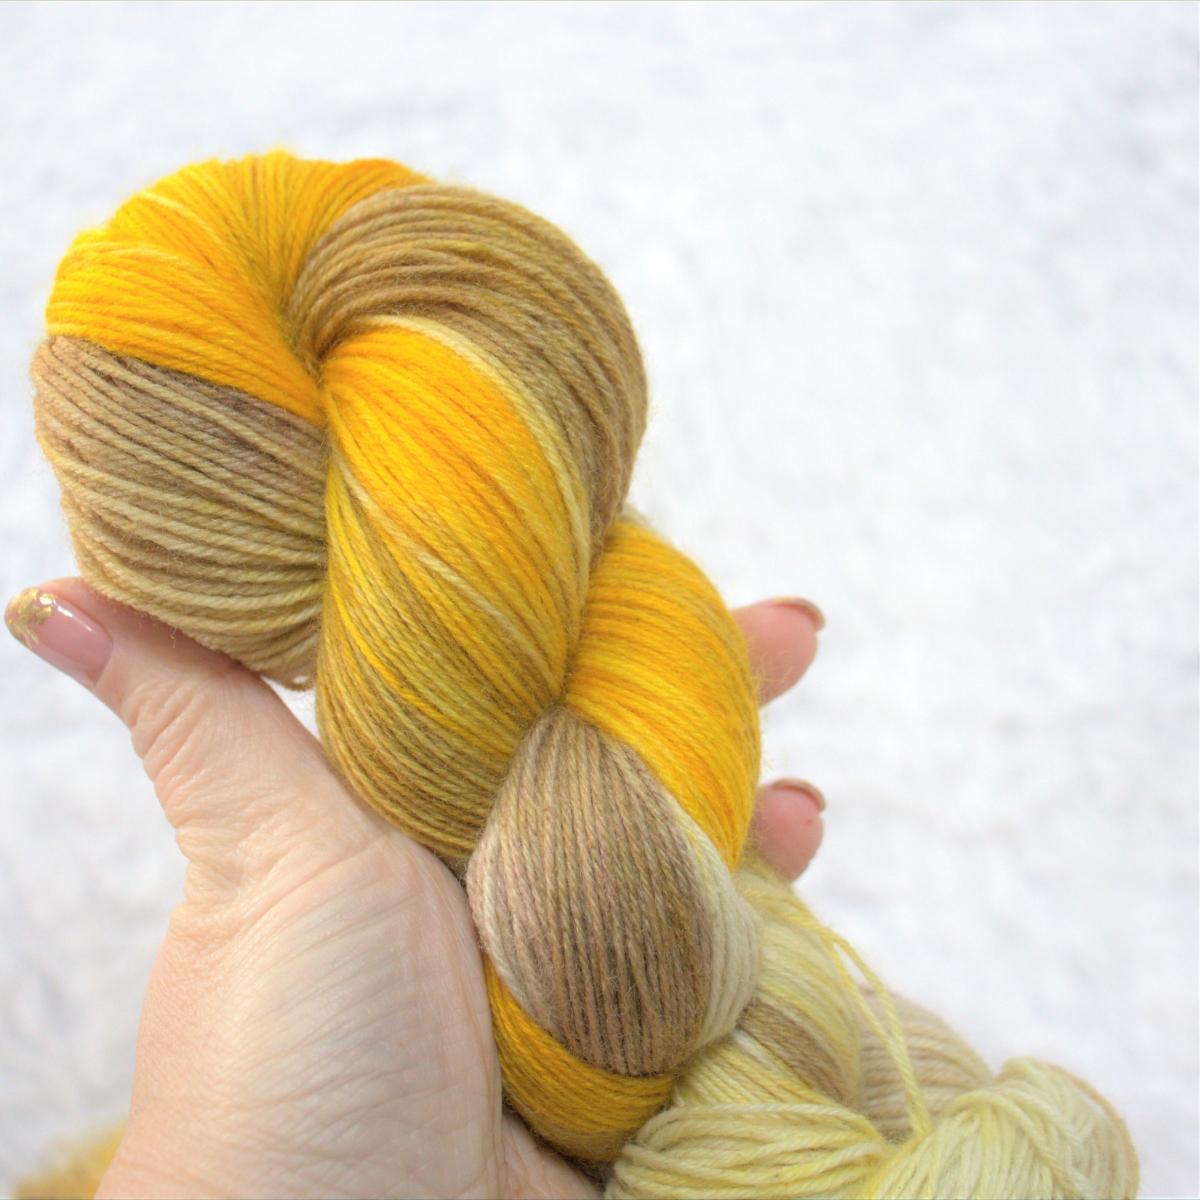 woodico.pro hand dyed yarn 049 2 1200x1200 - Hand dyed yarn / 049